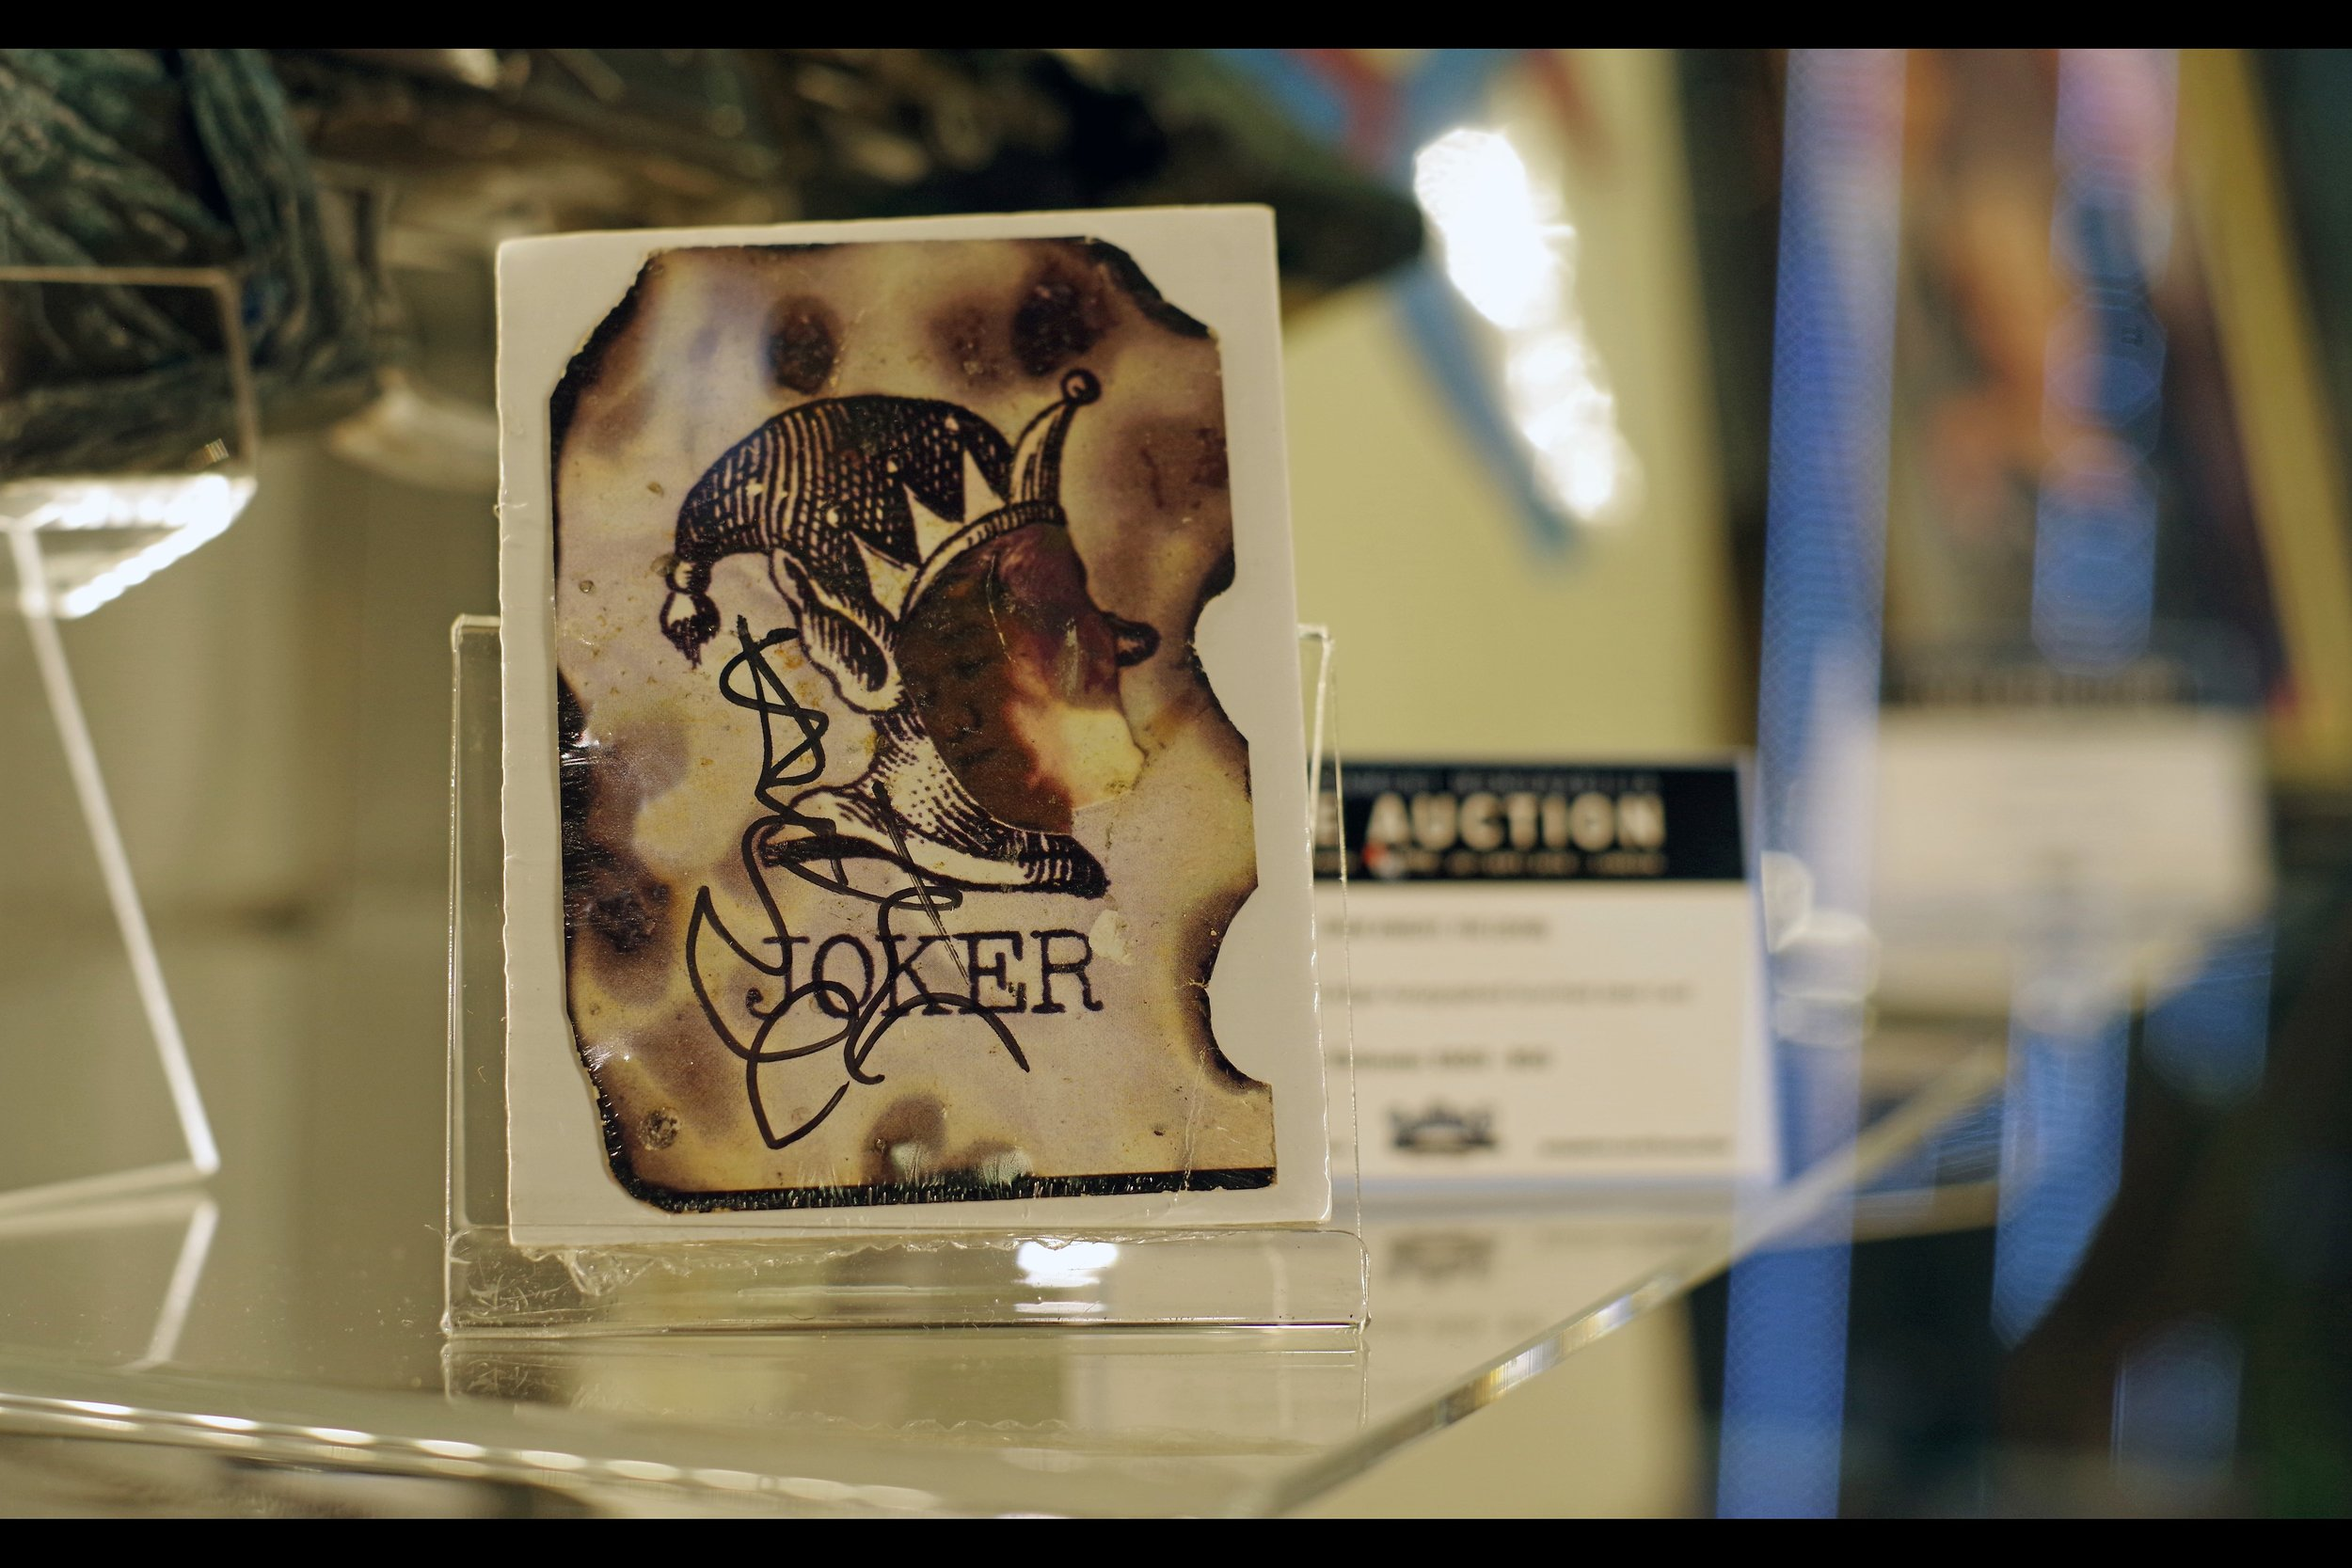 """Here's my card. Got some Australian guy to autograph it""  Heath Ledger Autographed Joker Card. Winning bid: £10,000"